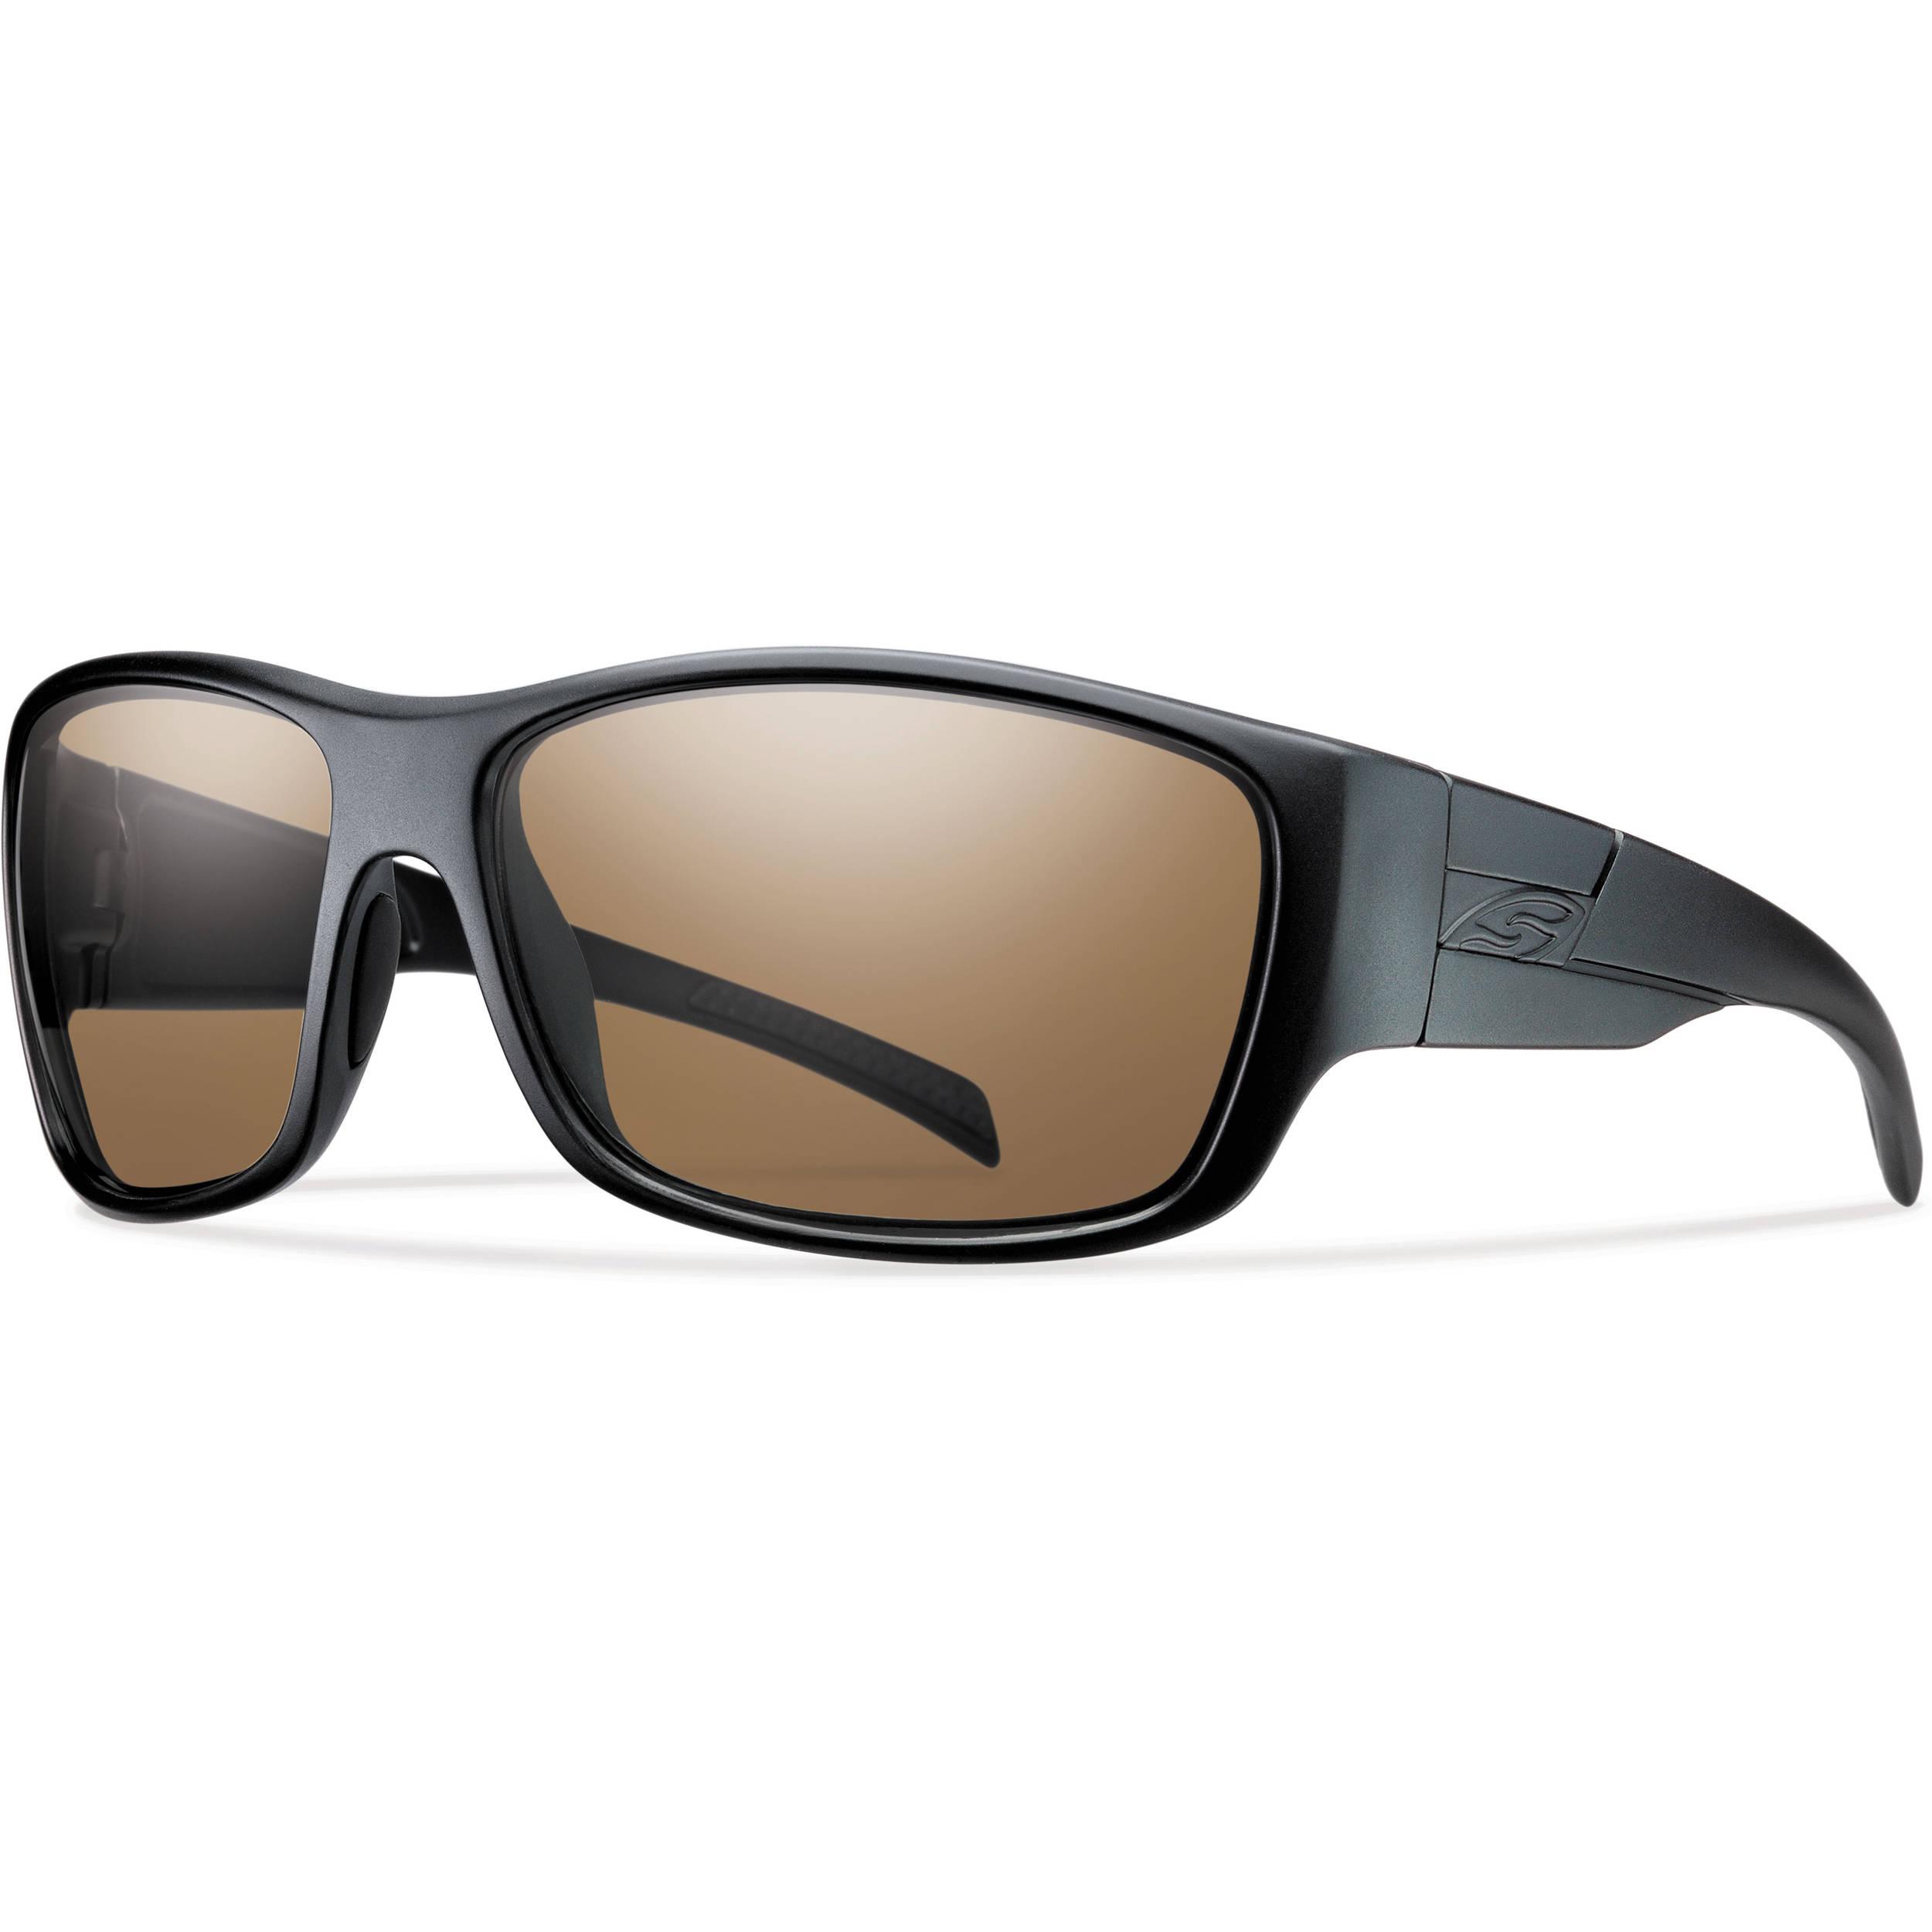 2608cdf0d64 Smith Optics Frontman Elite Tactical Sunglasses (Black - Polarized Brown  Lens)